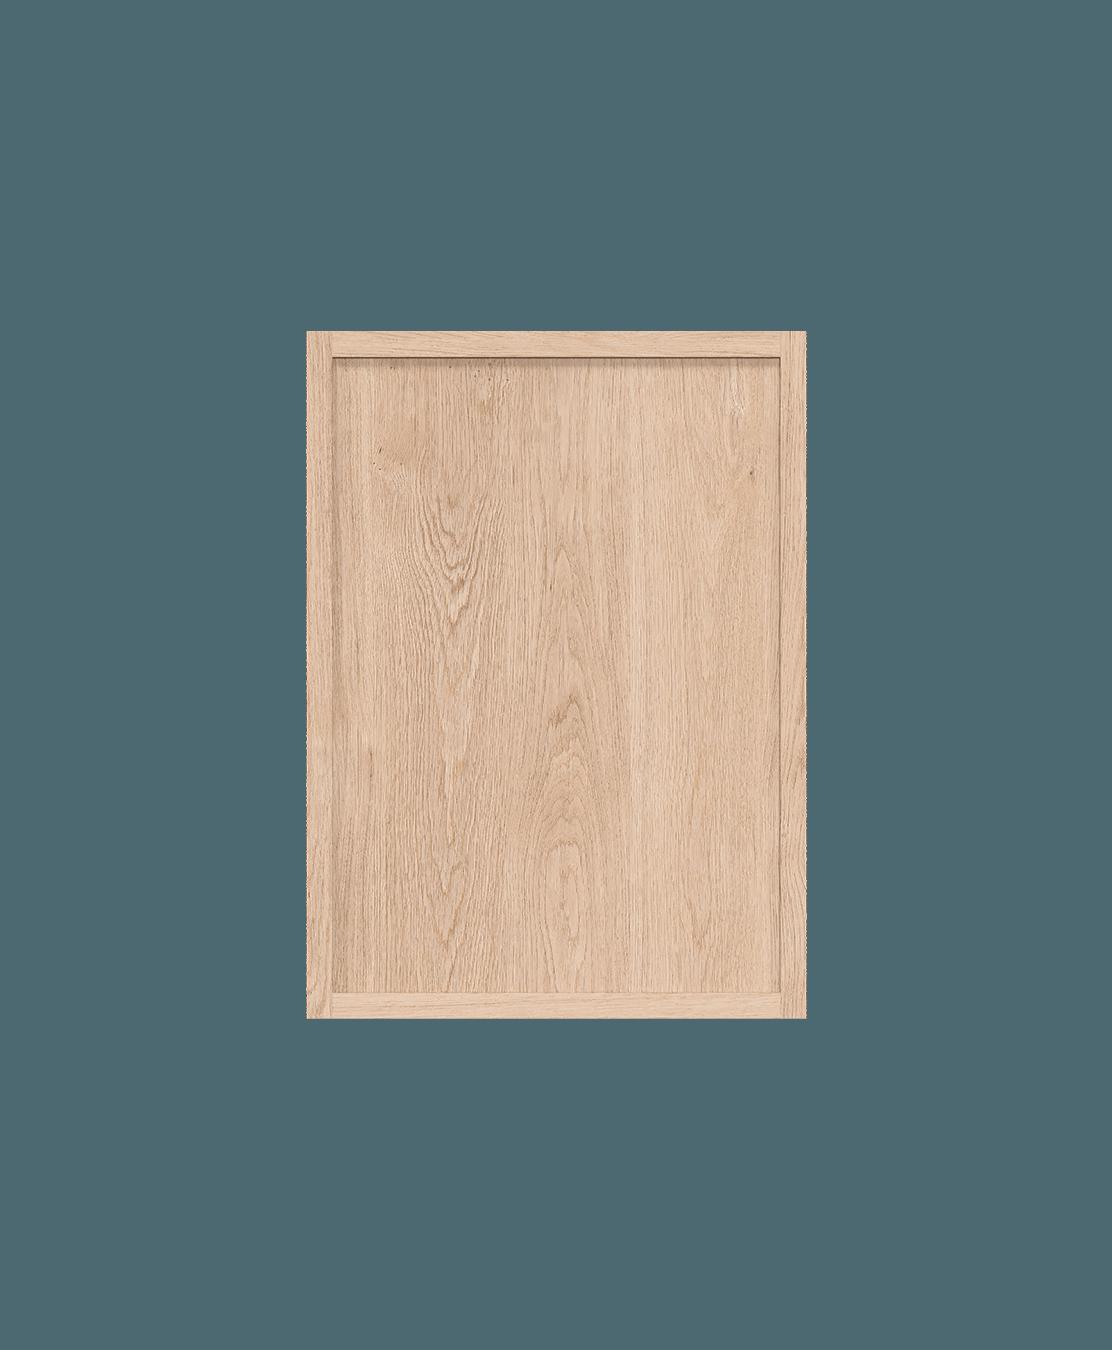 coquo radix white oak solid wood modular 2 glass doors wall upper kitchen cabinet 12 inch C1-W-2412-0201-NA